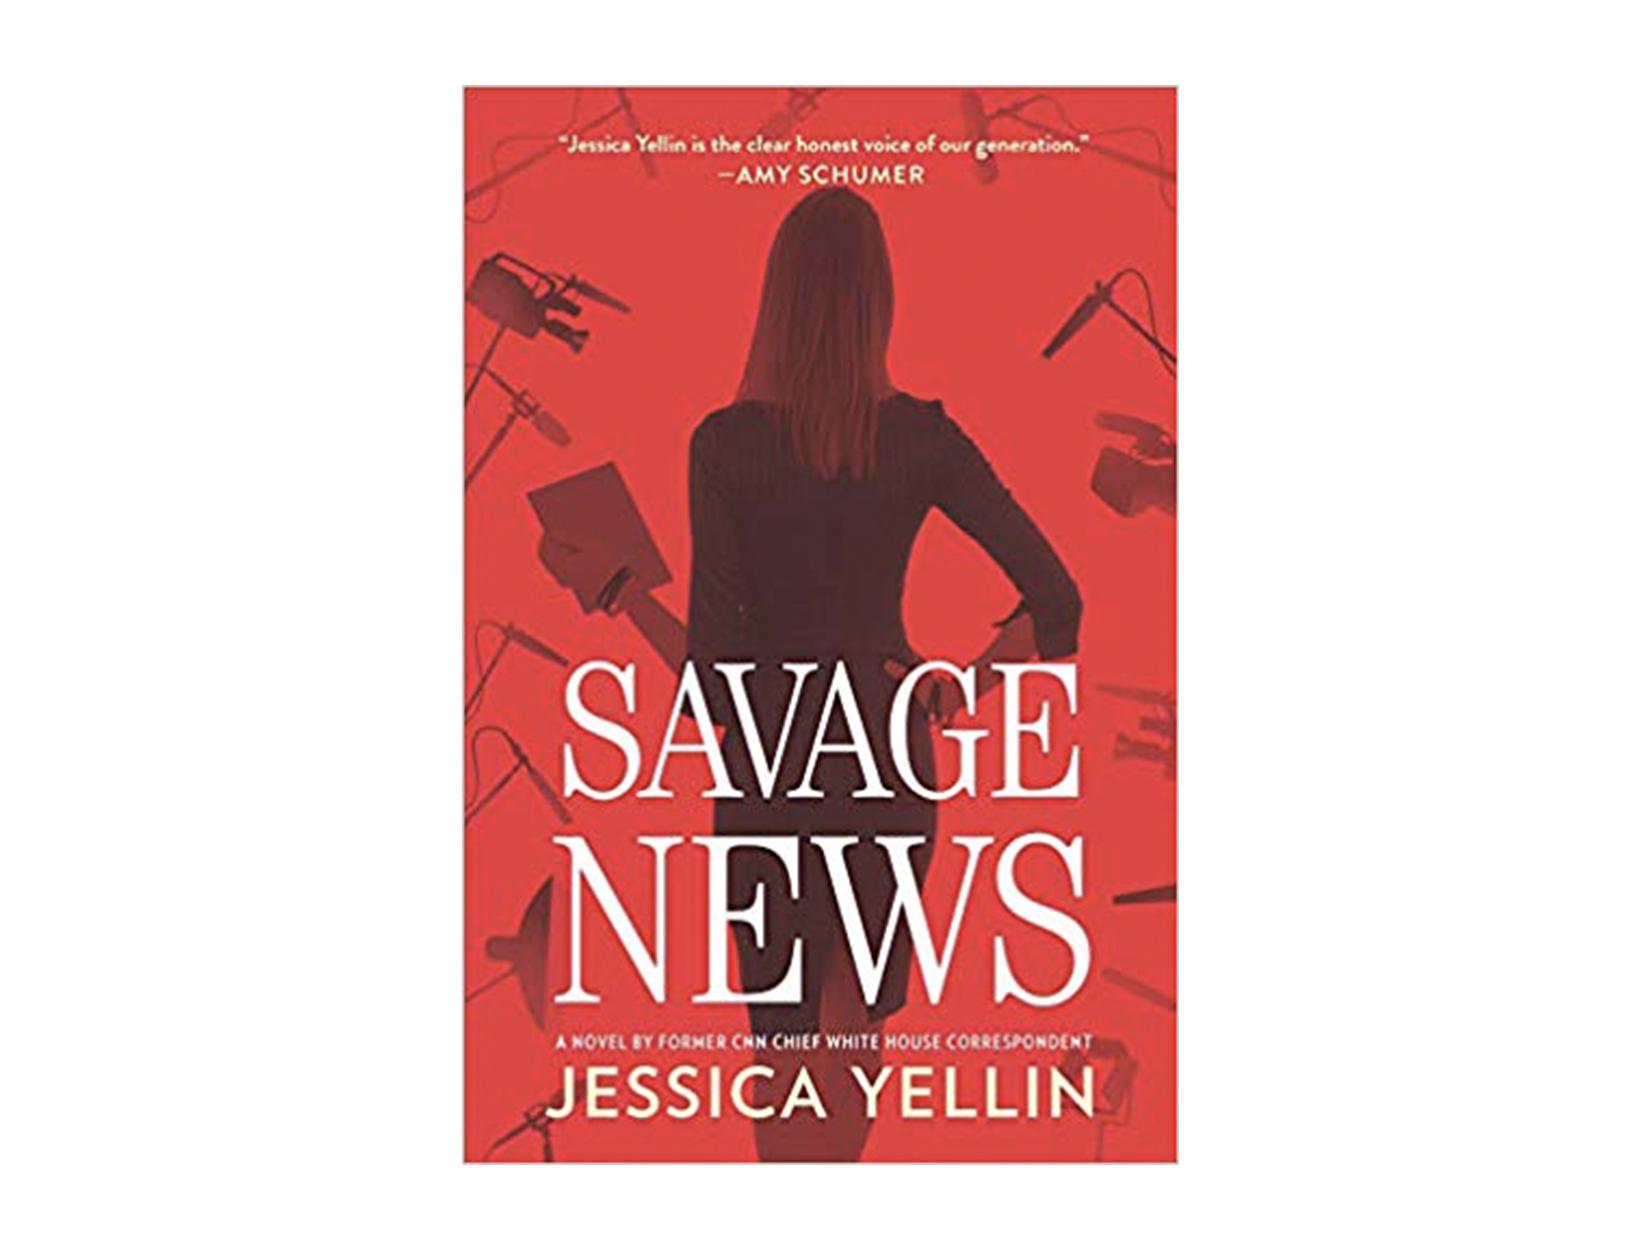 <em>Savage News</em> by Jessica Yellin